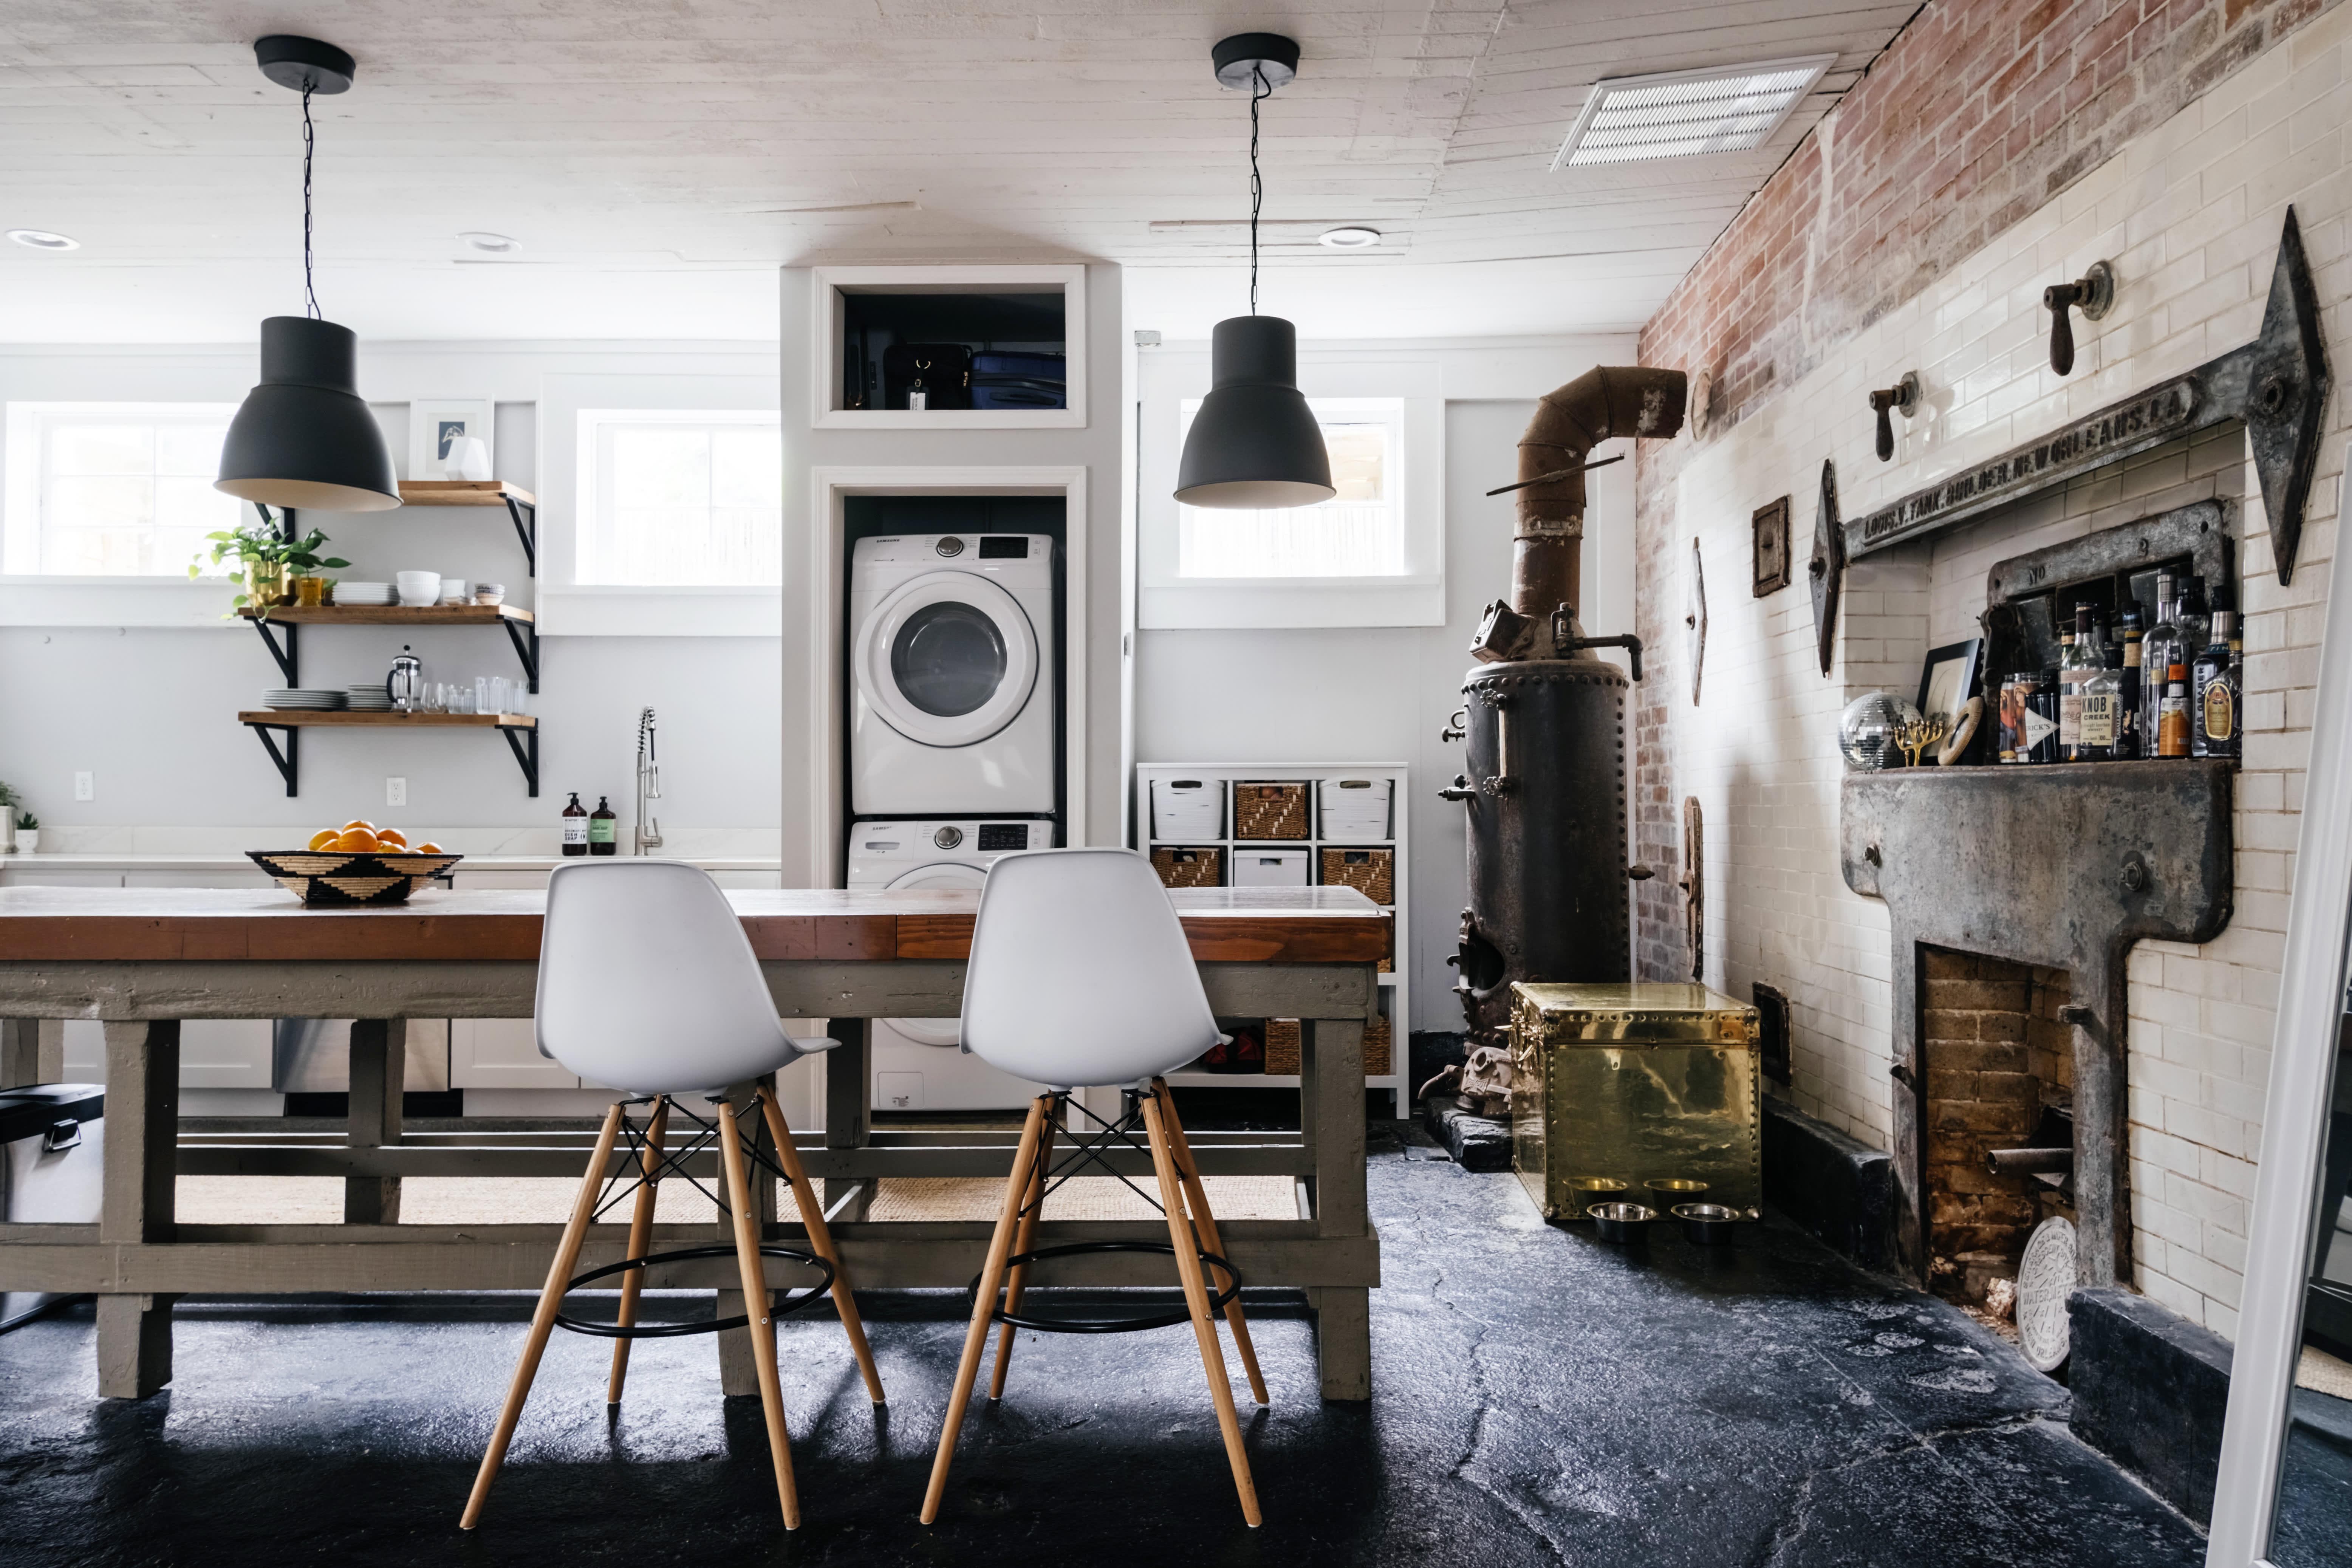 Warm Industrial Studio Apartment in New Orleans | Apartment ...